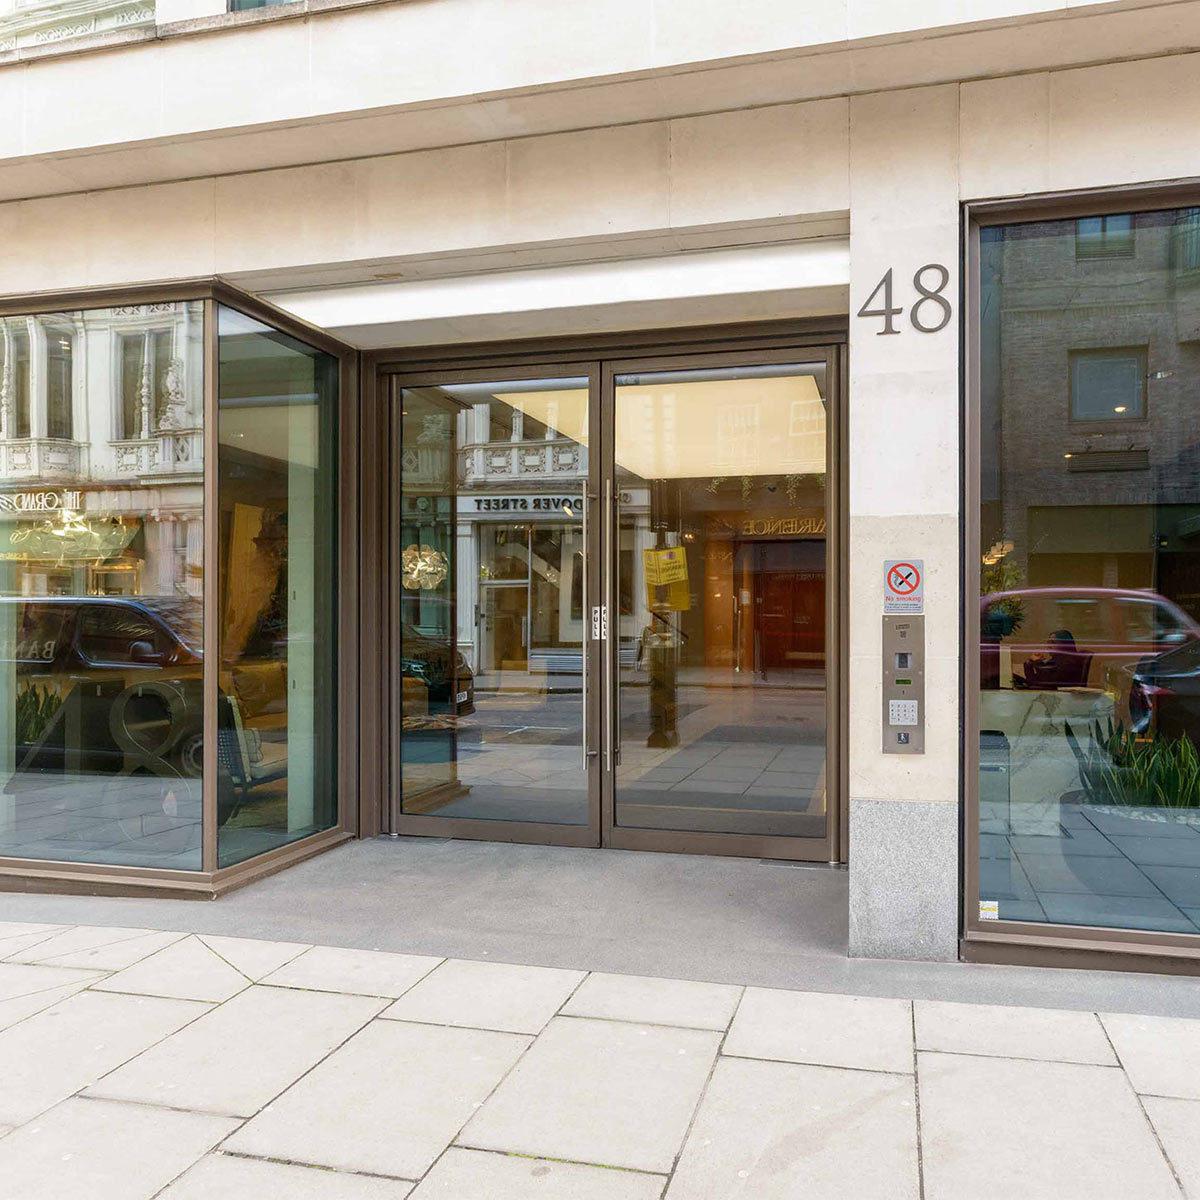 Crosstree portfolio - 43-48 Dover Street